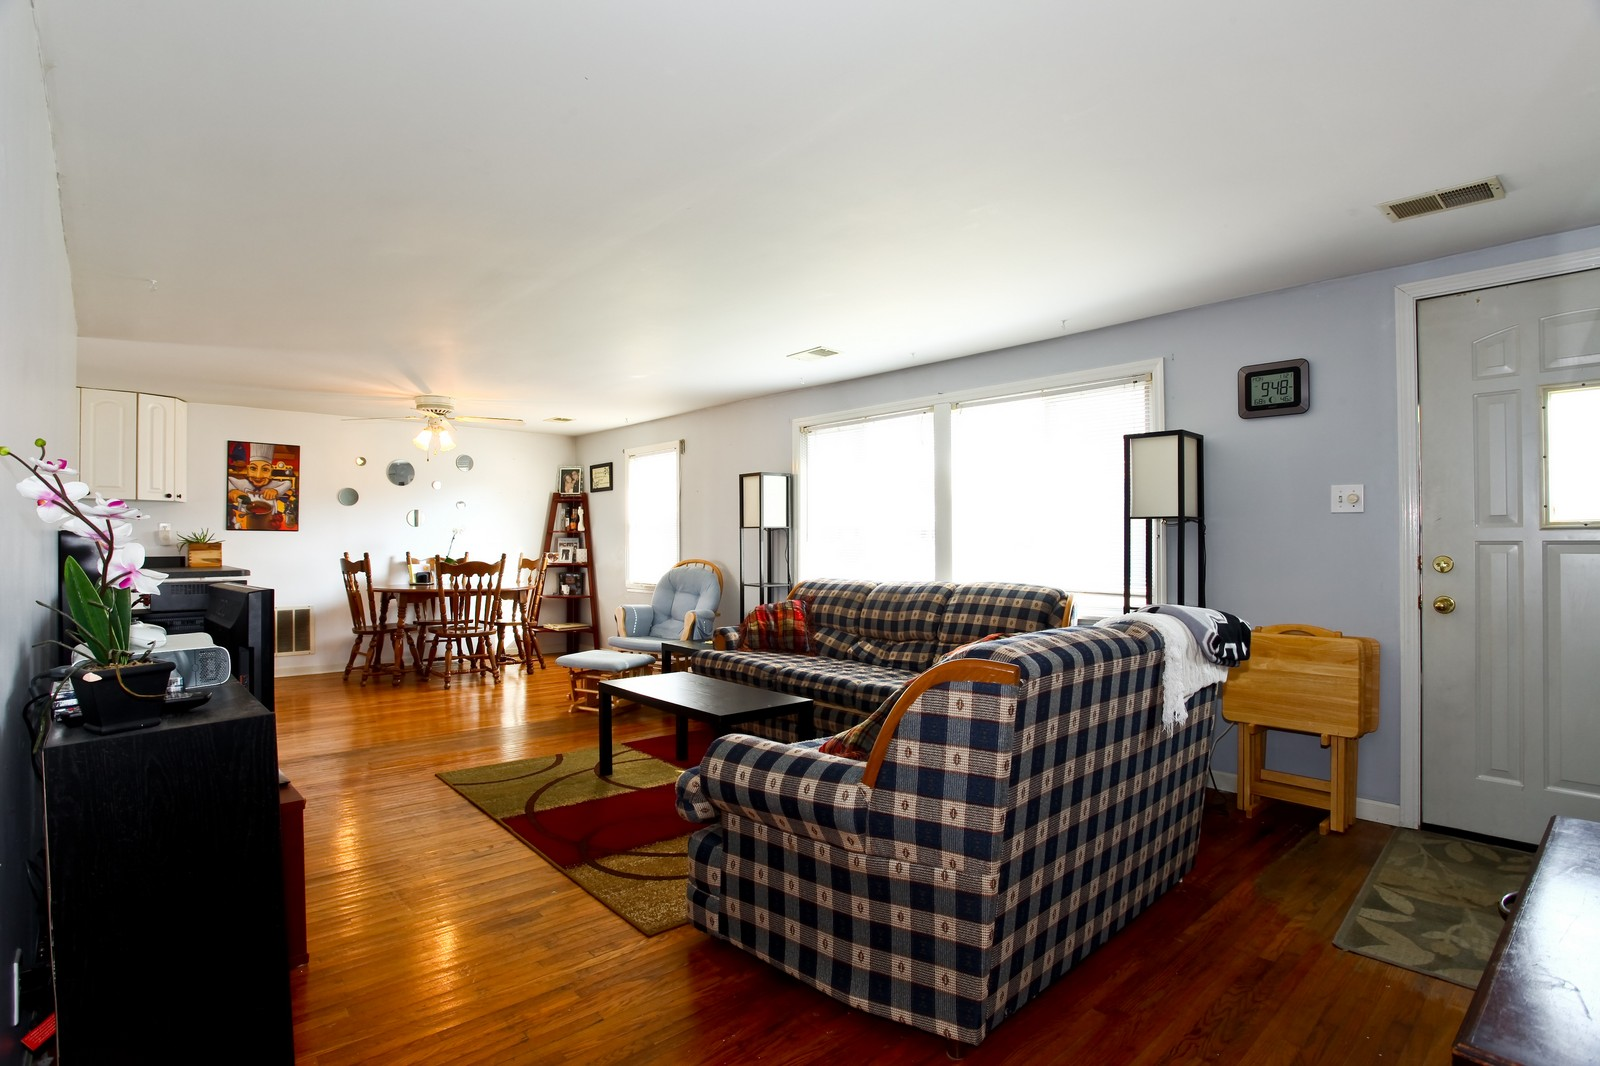 Real Estate Photography - 929 Seaman, Dekalb, IL, 60115 - Living Room / Dining Room